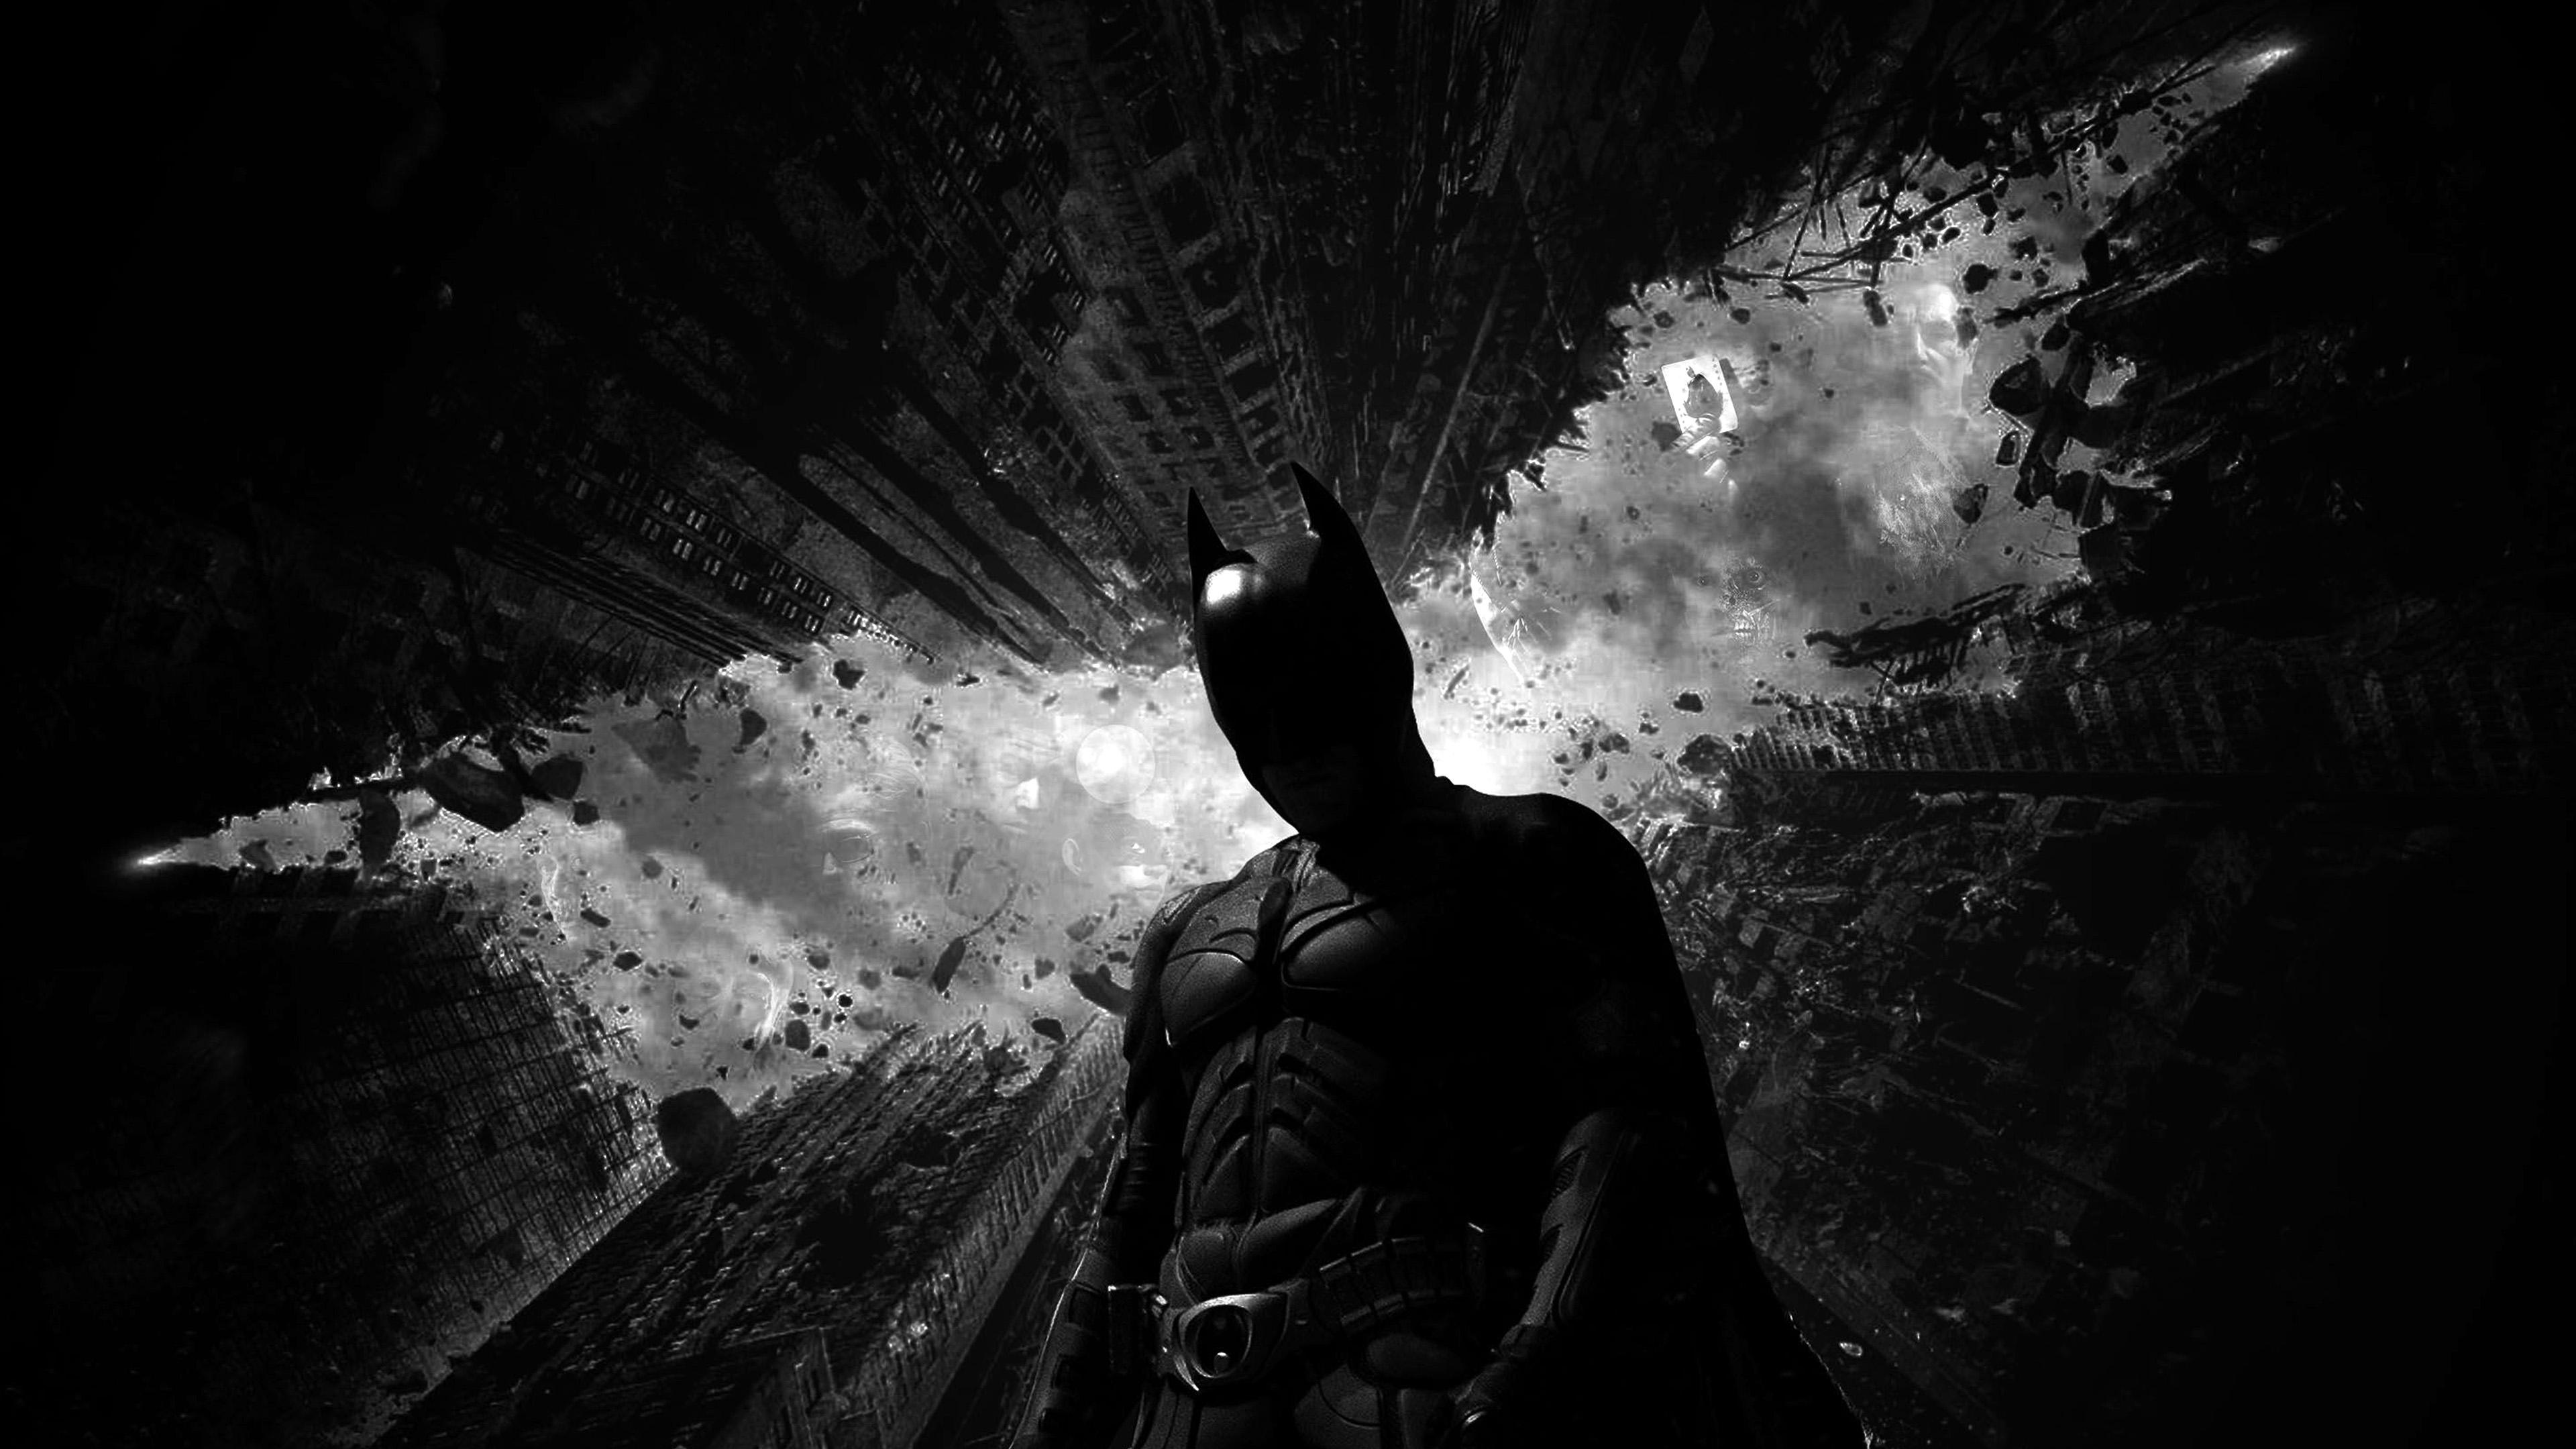 Download Wallpaper Mac Batman - papers  Gallery_433354.jpg